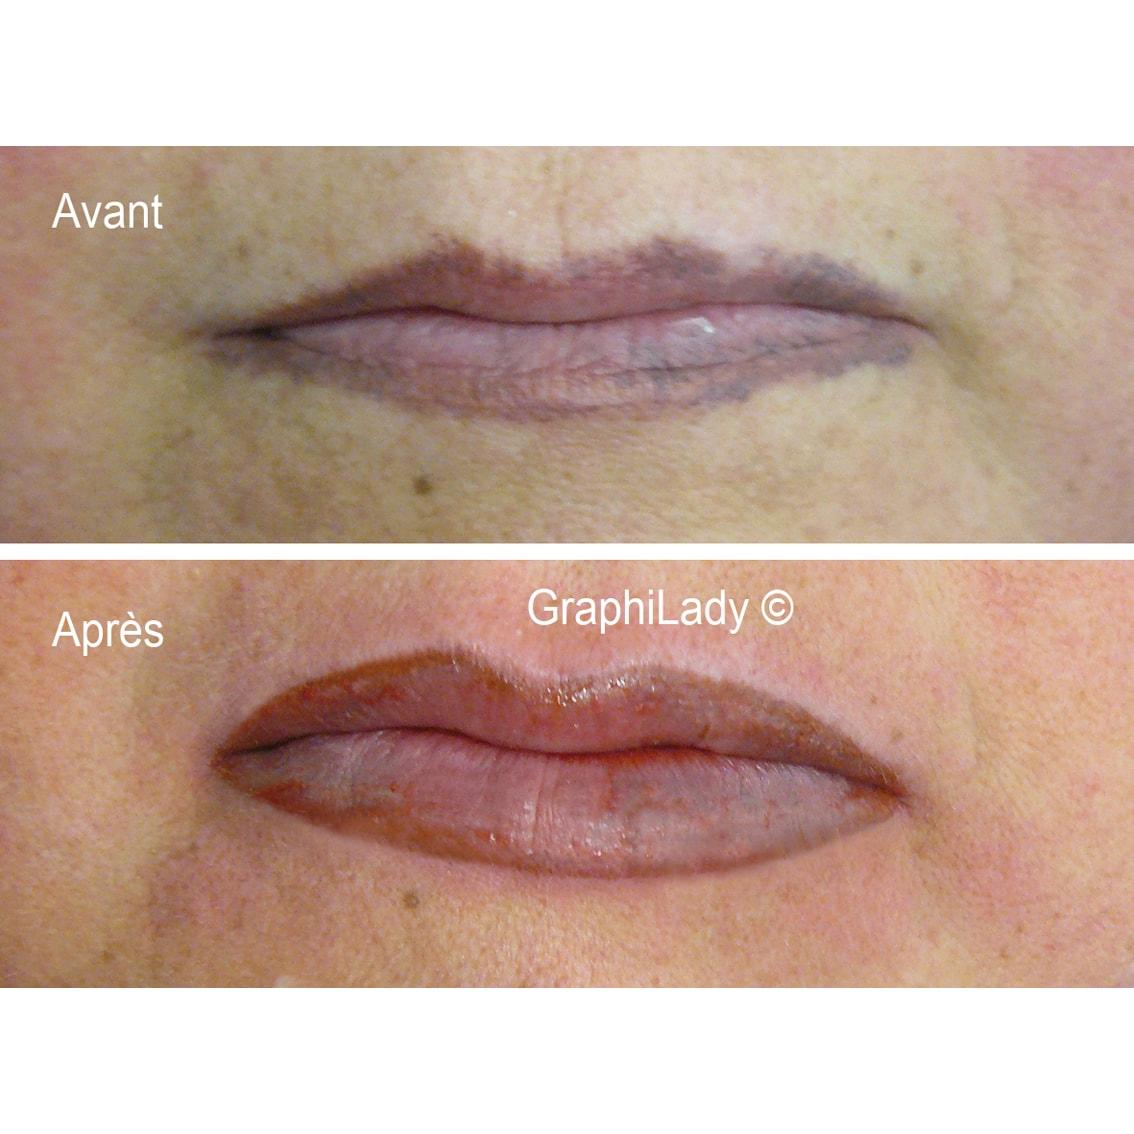 maquillage semi-permanent recouvrement 06